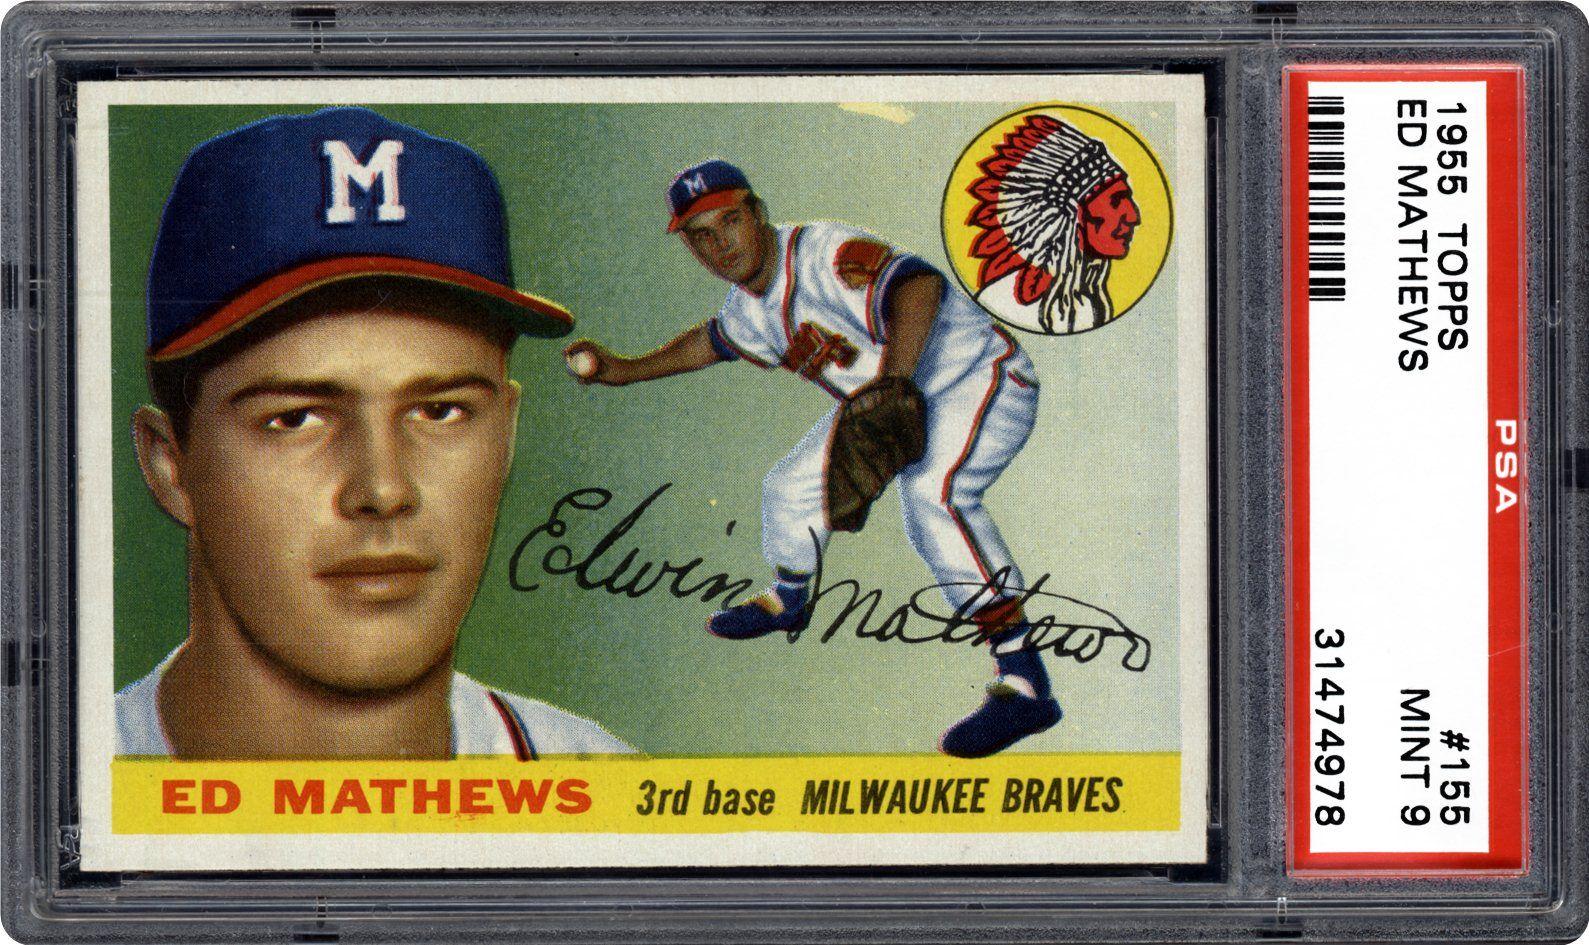 1955 Topps Ed Mathews Psa Cardfacts